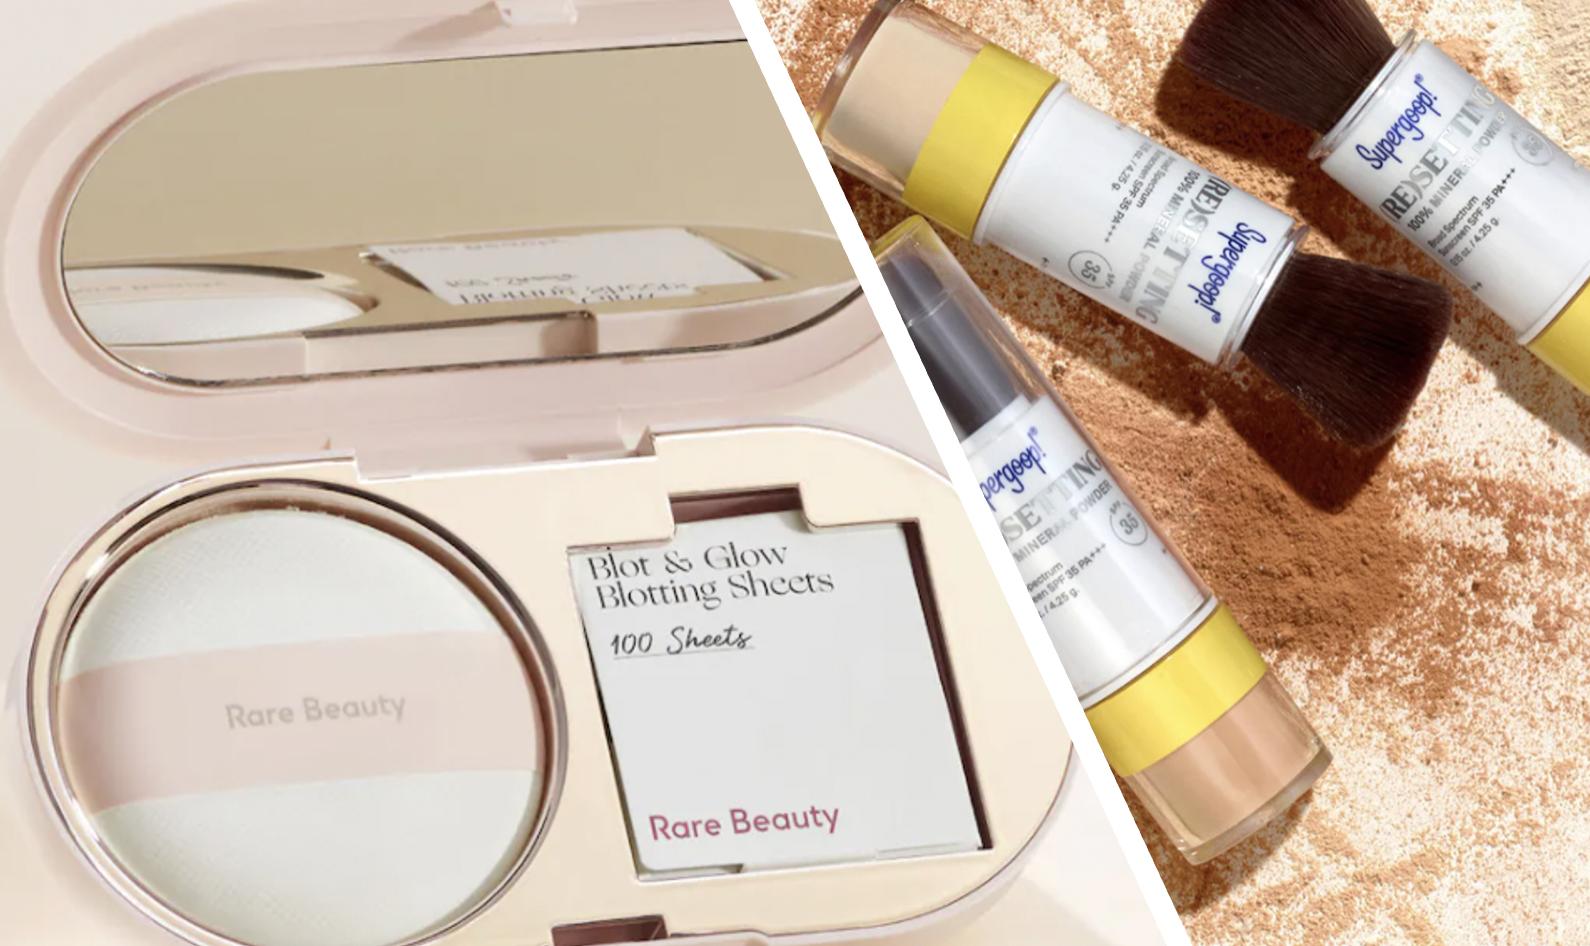 productos belleza verano calor rare beauty supergoop